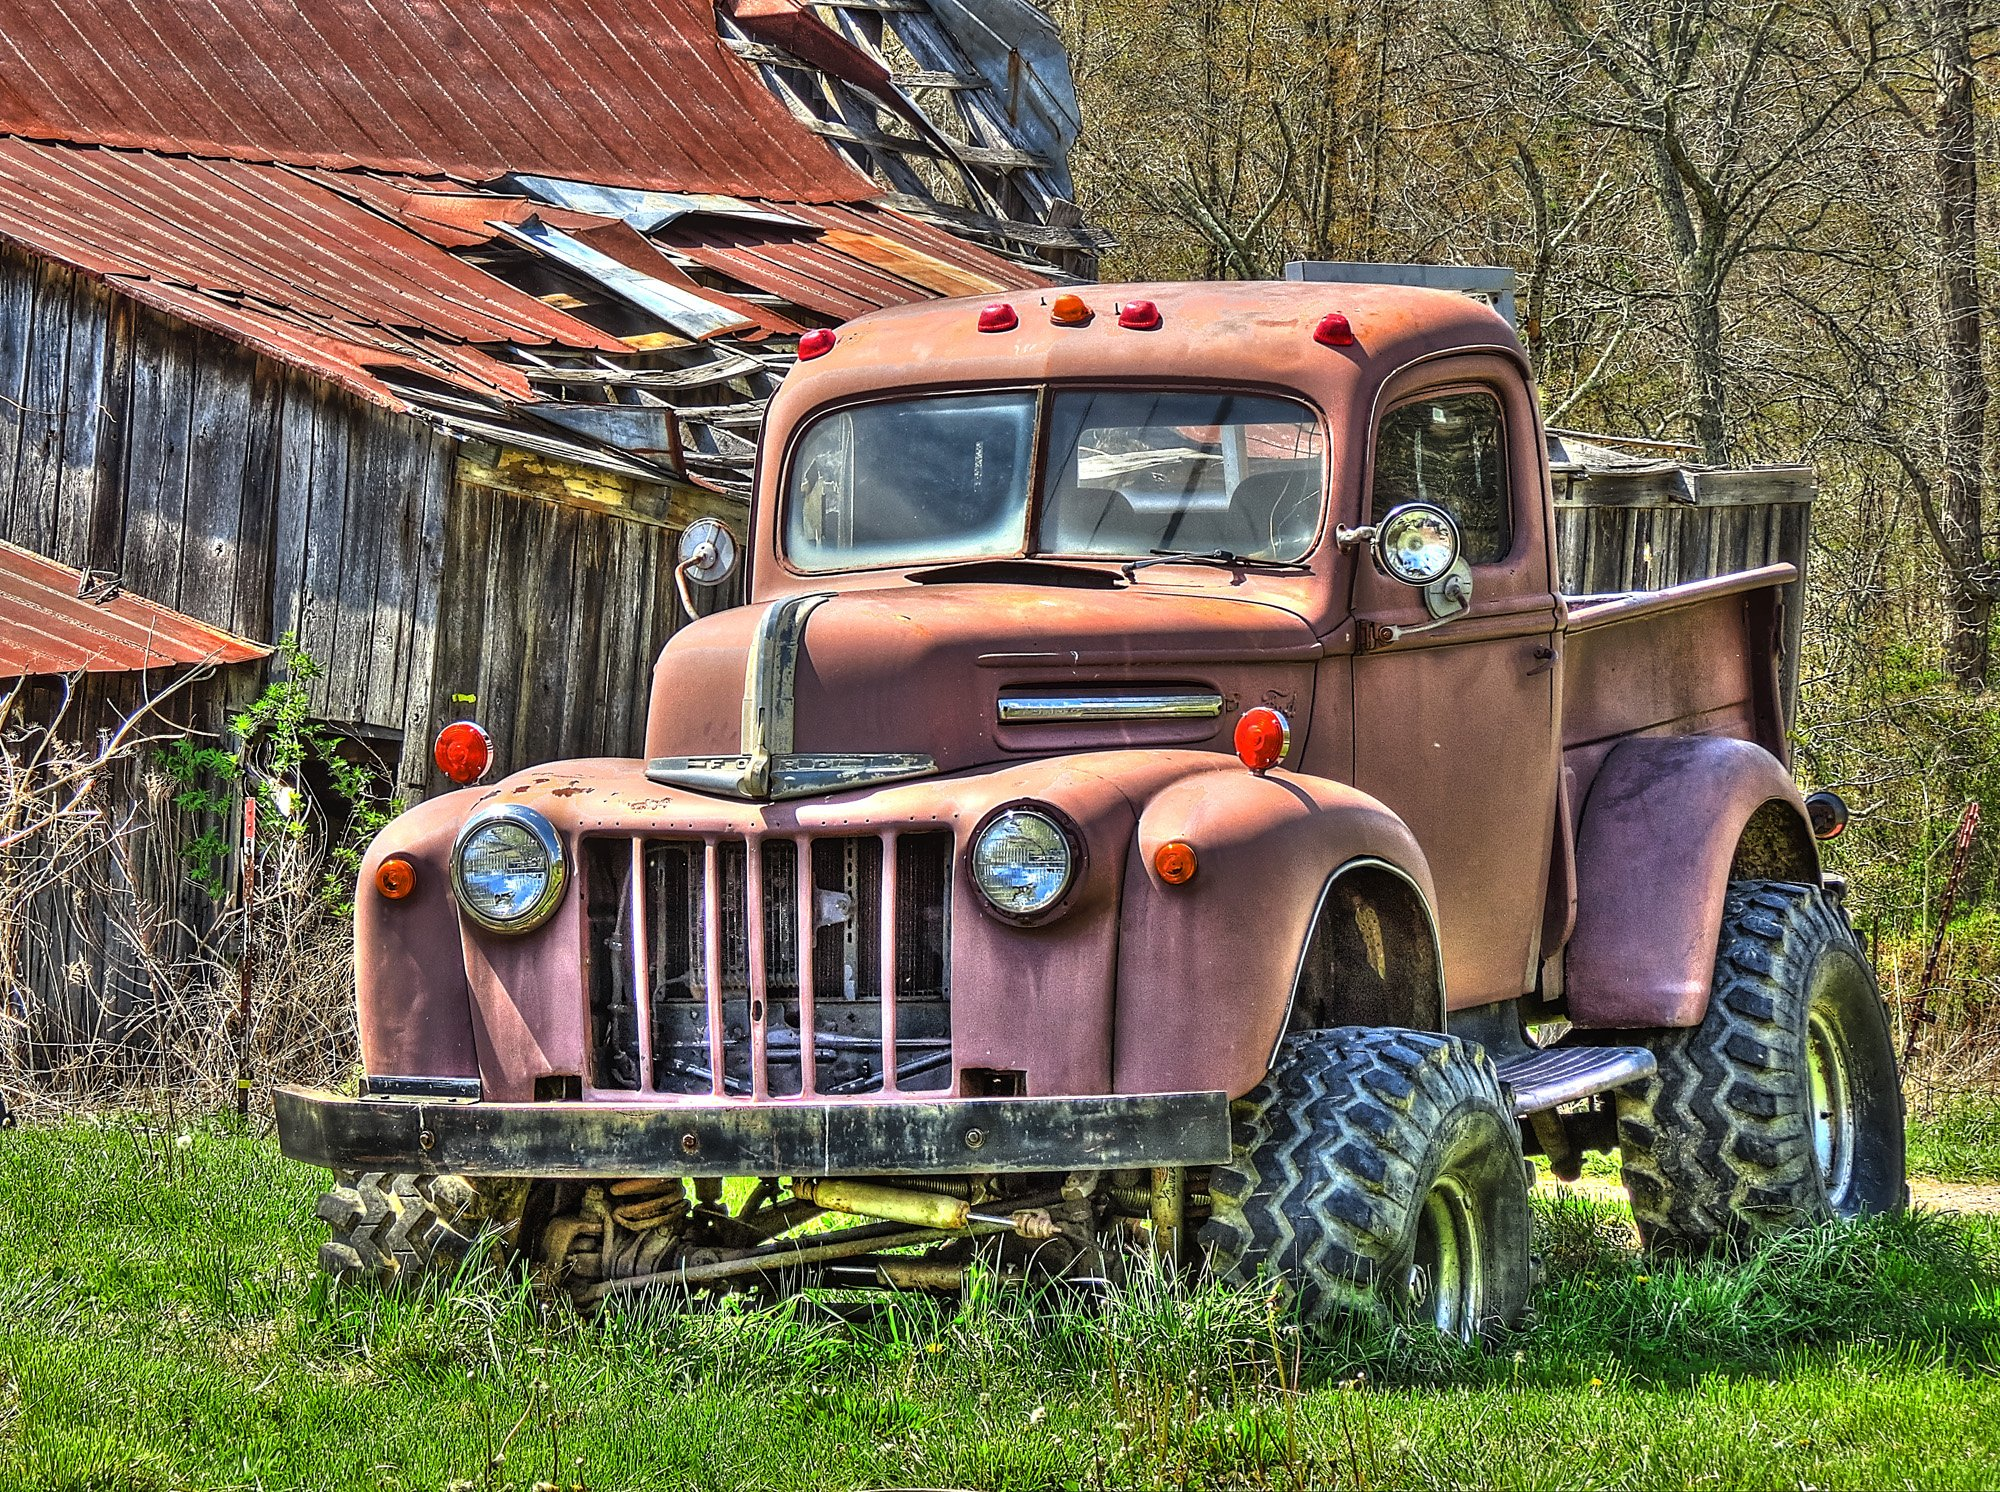 Rusty Old Truck 1940 039 S Ford Truck Wallpaper 2000x1492